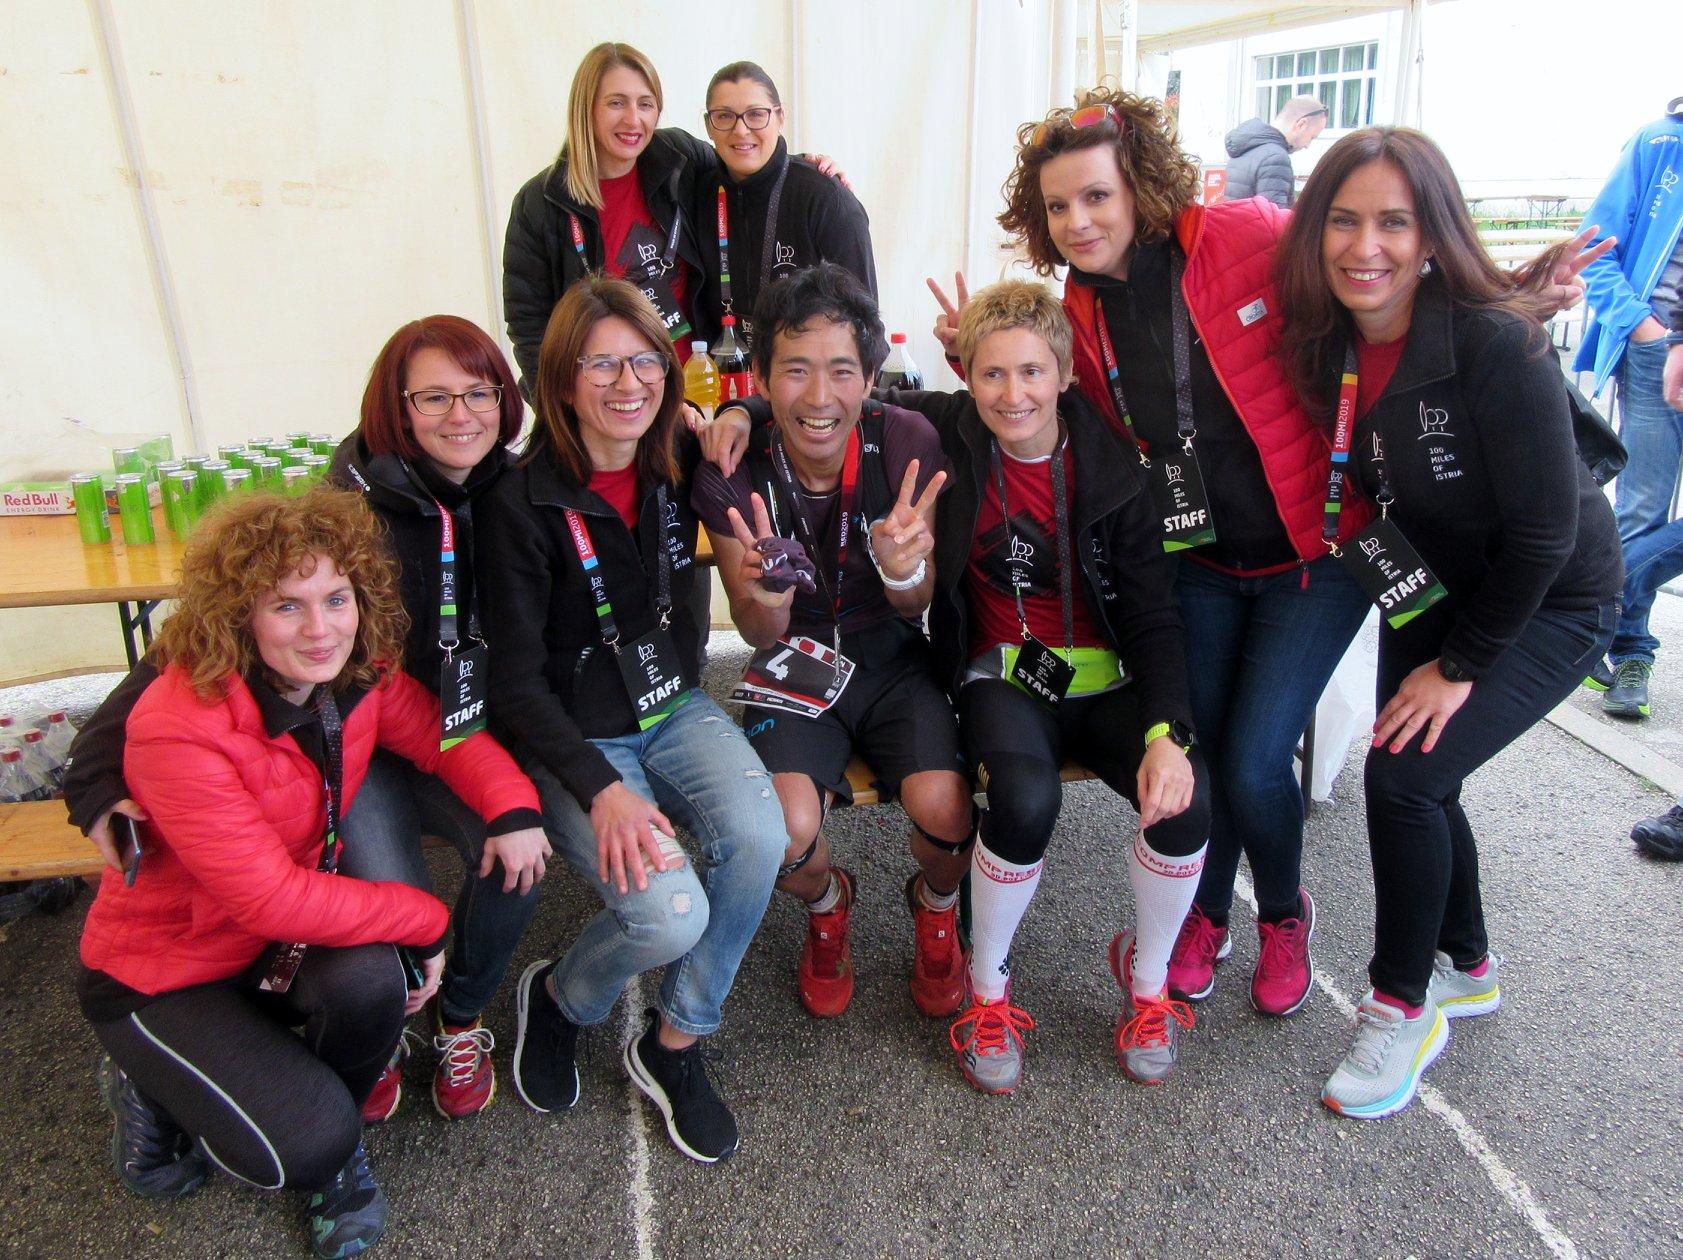 100 milja Istre, volonteri s pobejdnikom utrke na 168 km, Foto Torpedo runners